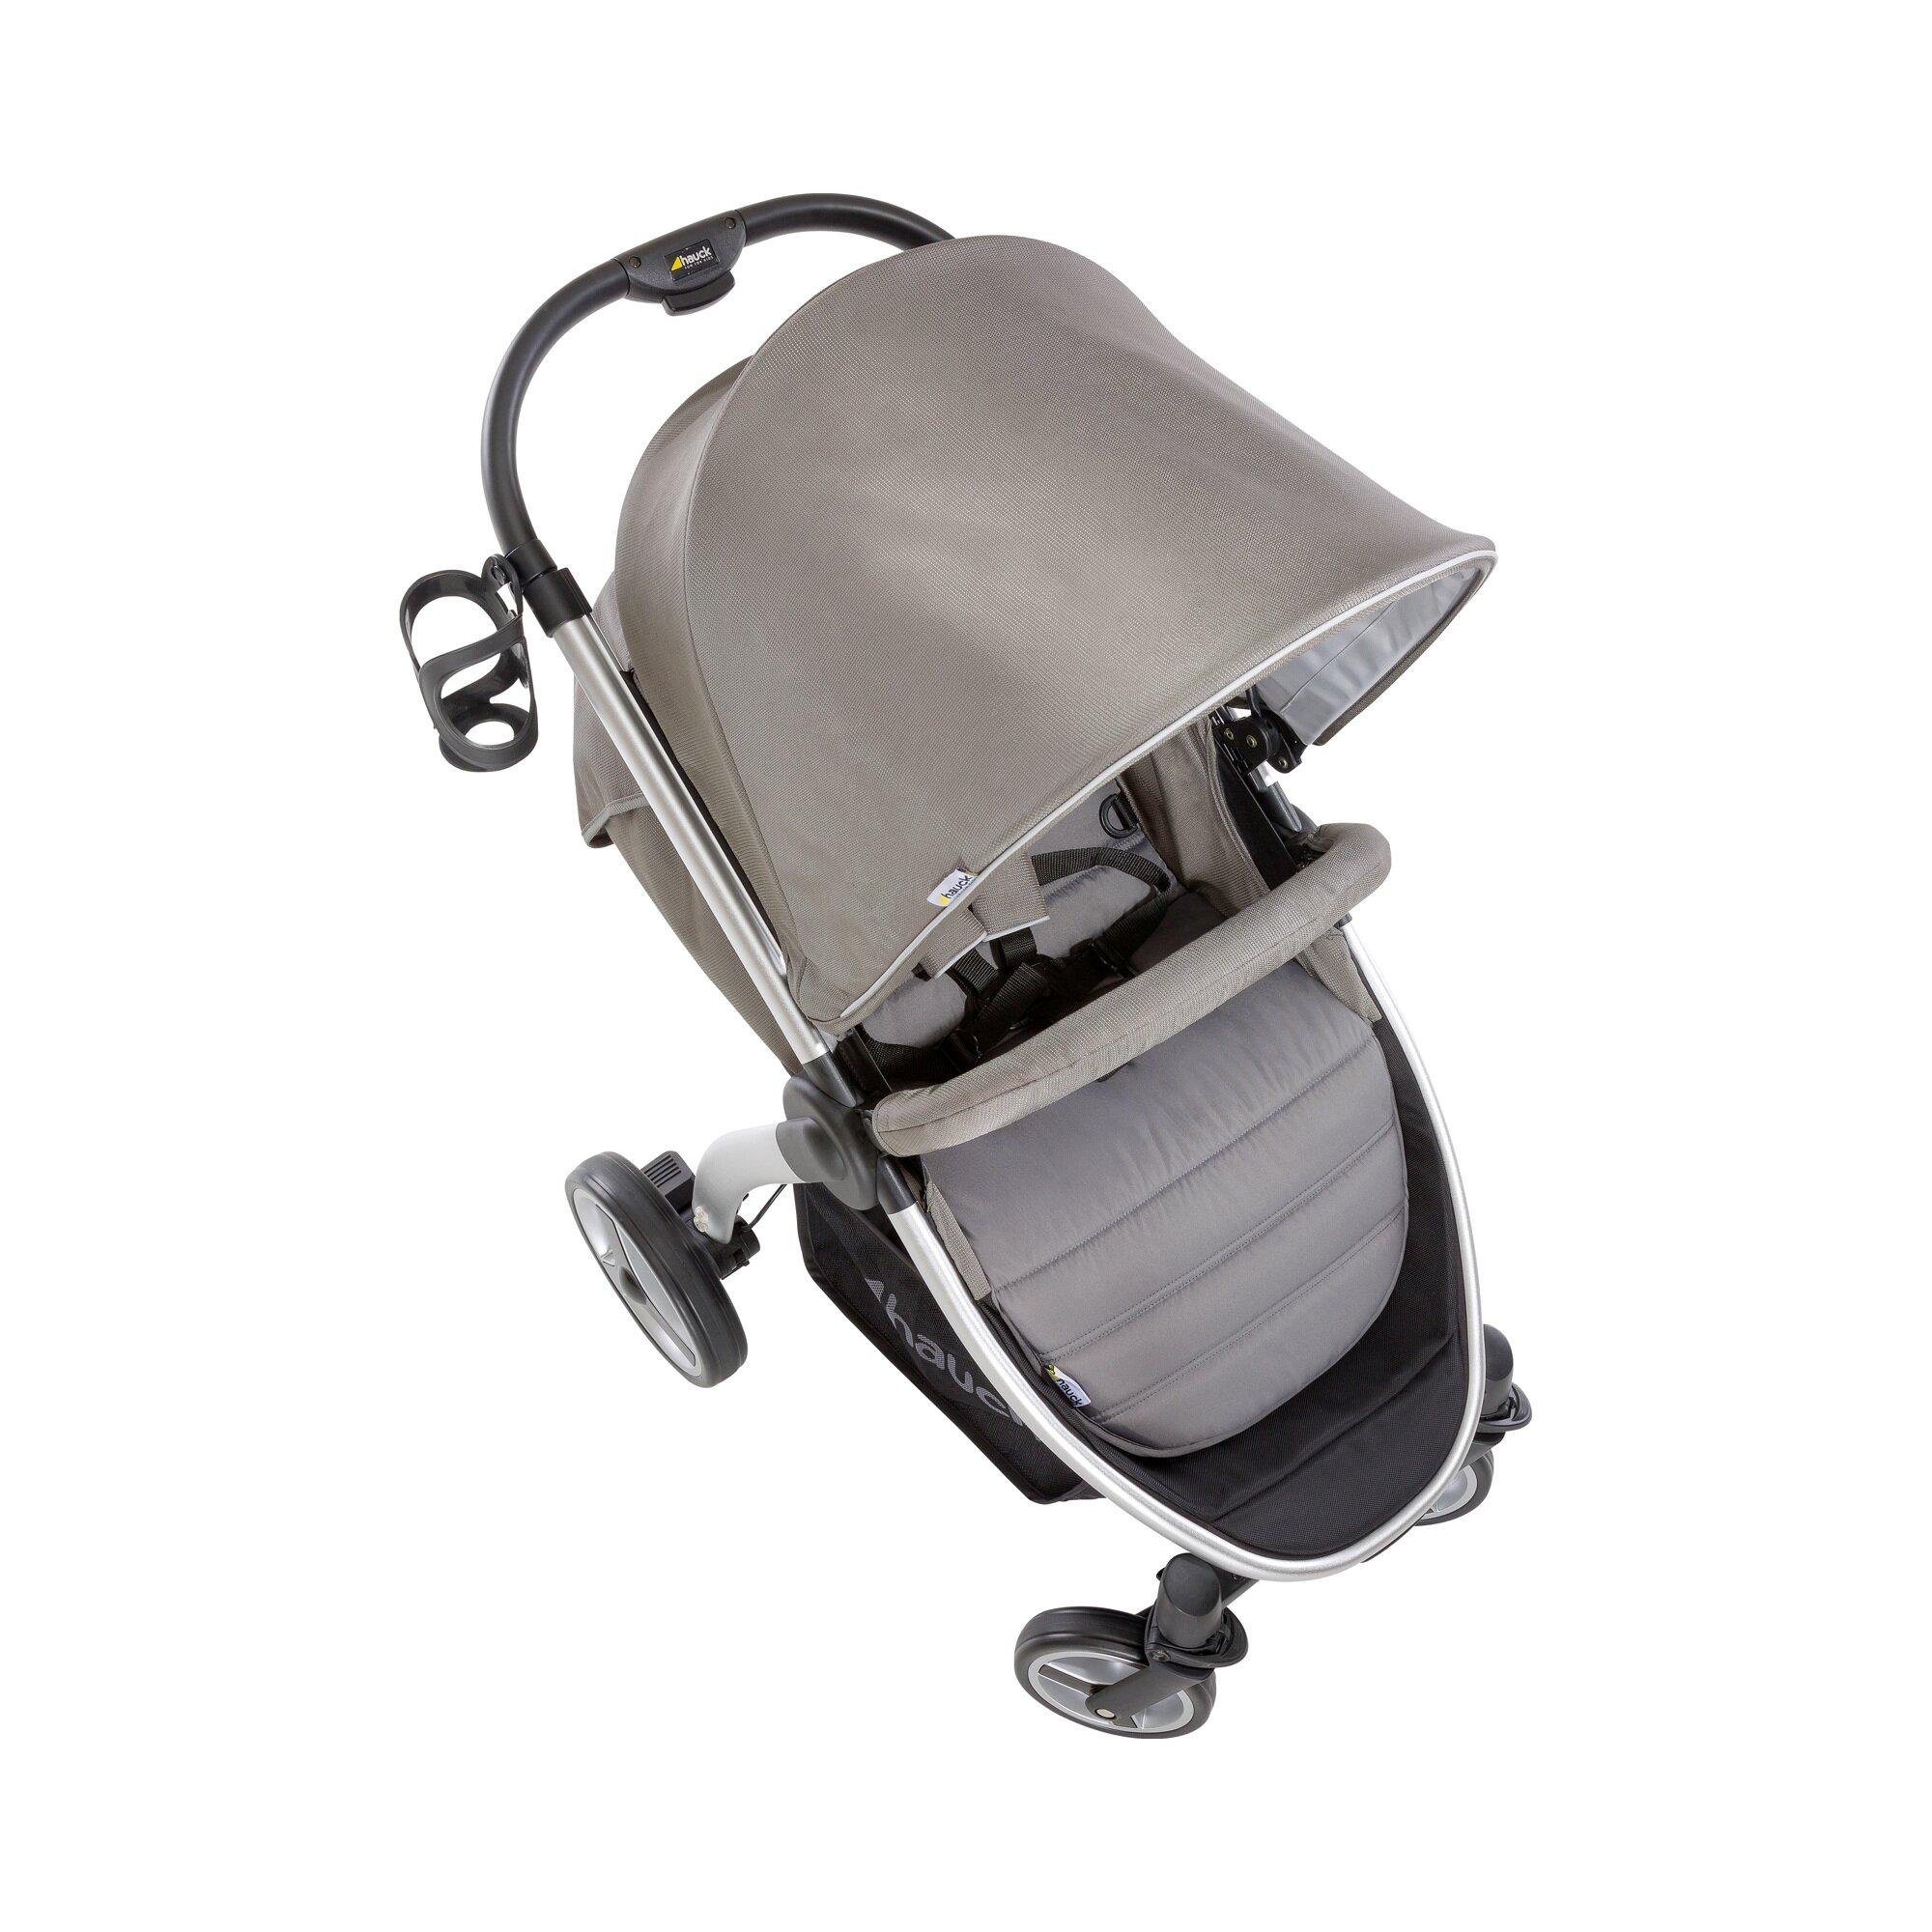 hauck-lift-up-4-buggy-mit-liegefunktion-grau